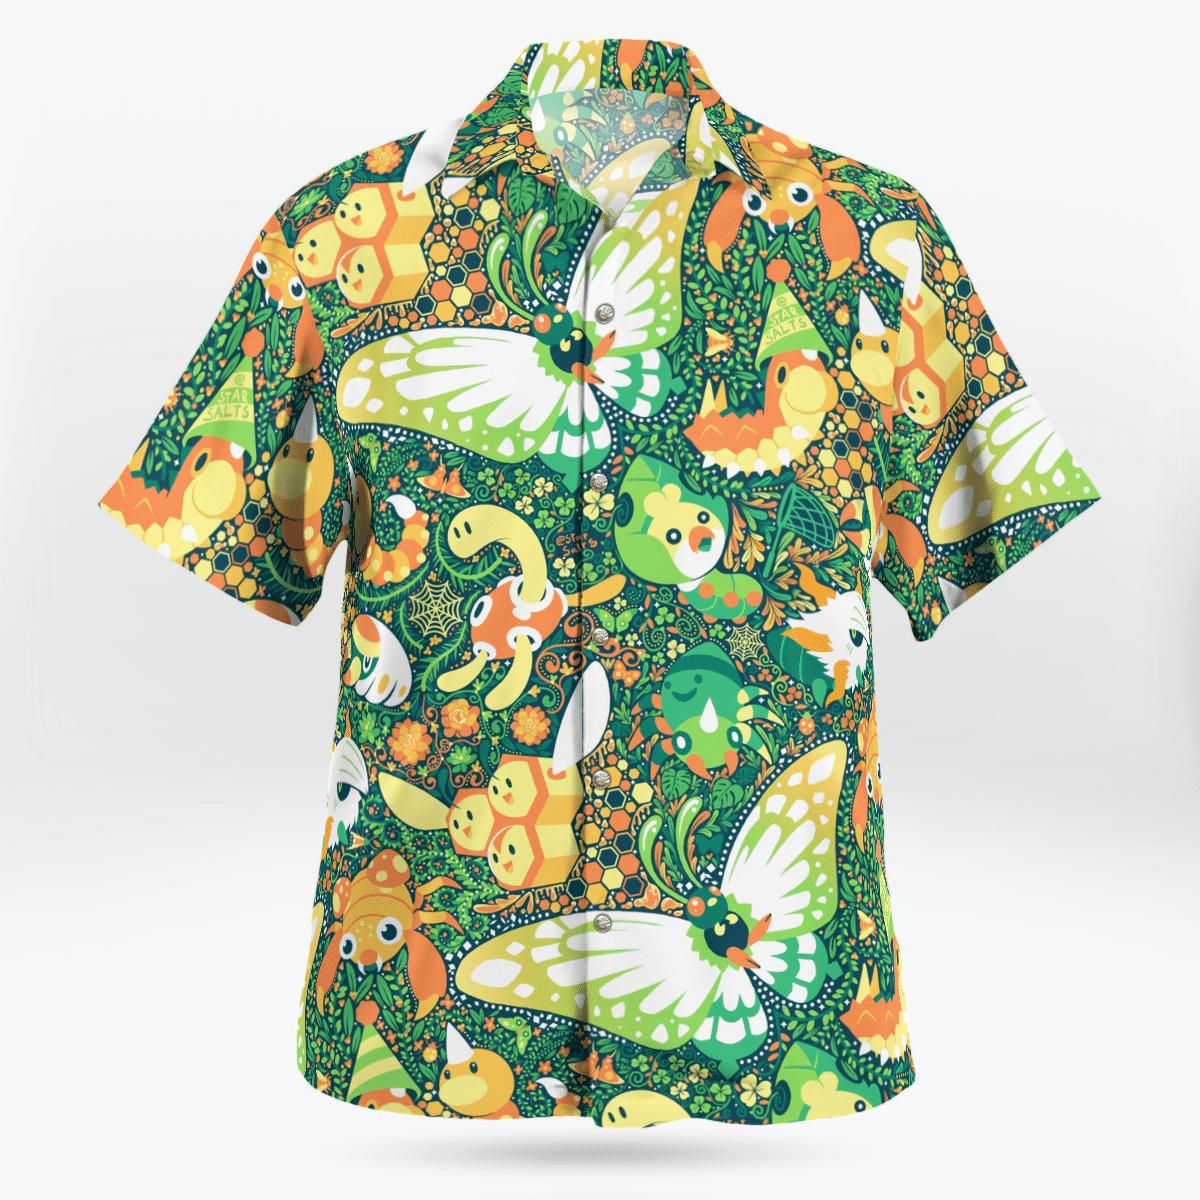 BUG Pokemon Hawaiian shirt 1